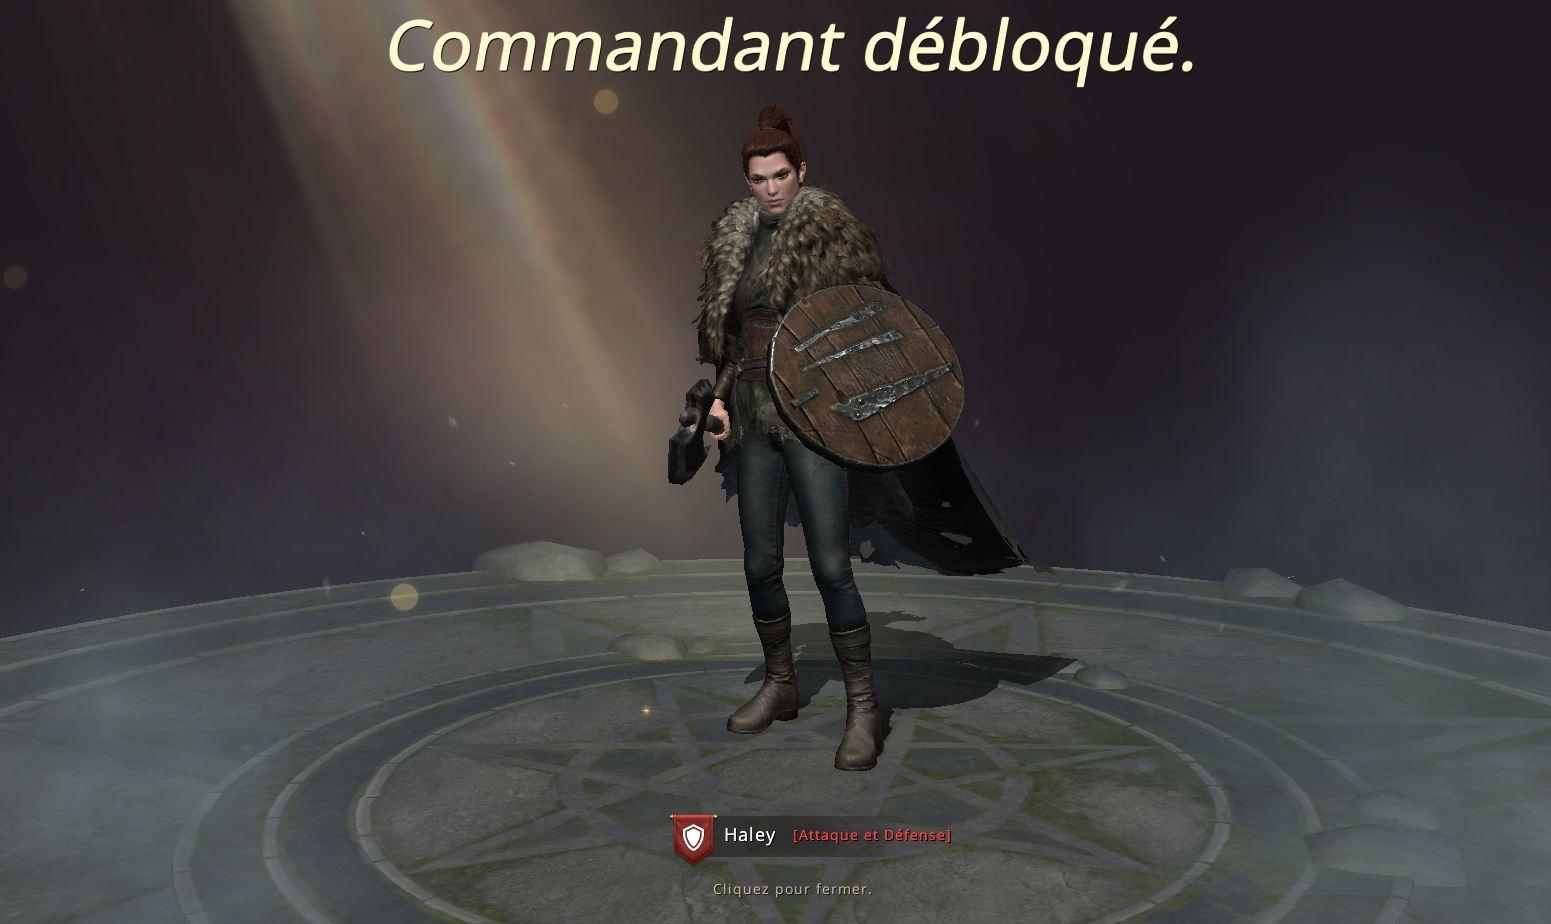 Commandant Haley